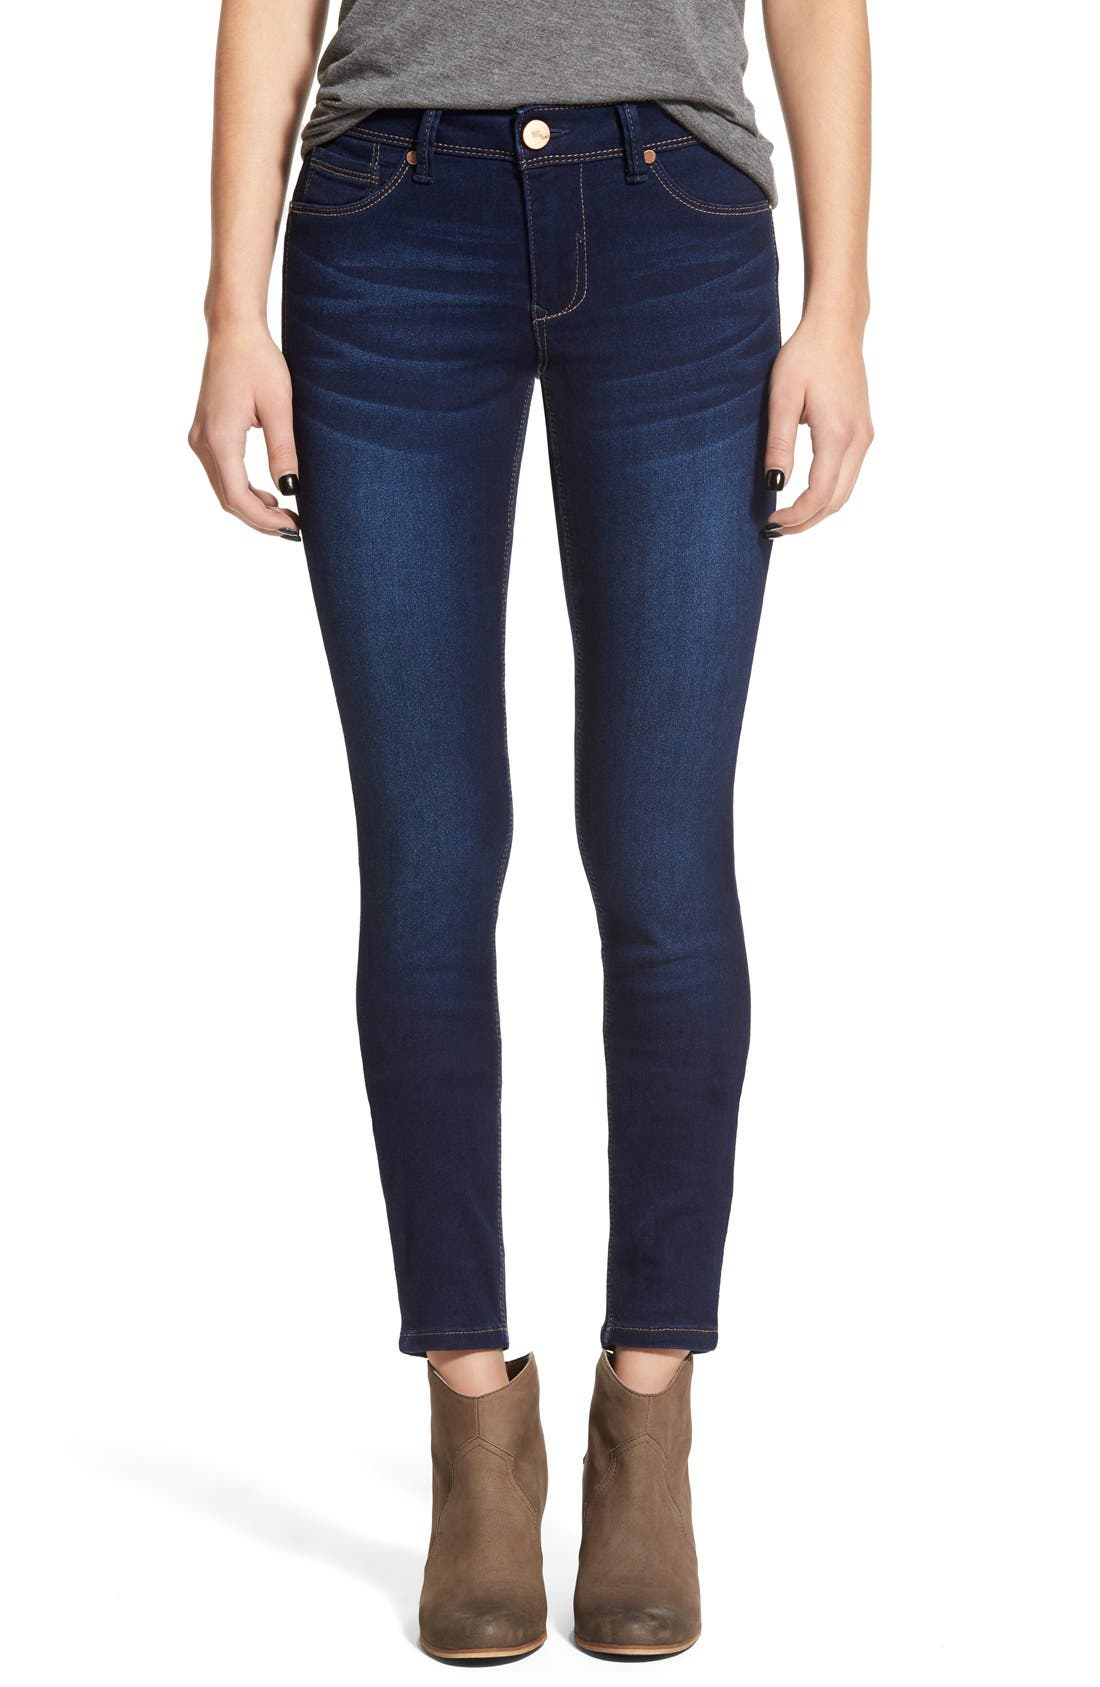 1822 DENIM, Butter Skinny Jeans, Main thumbnail 1, color, LENNOX